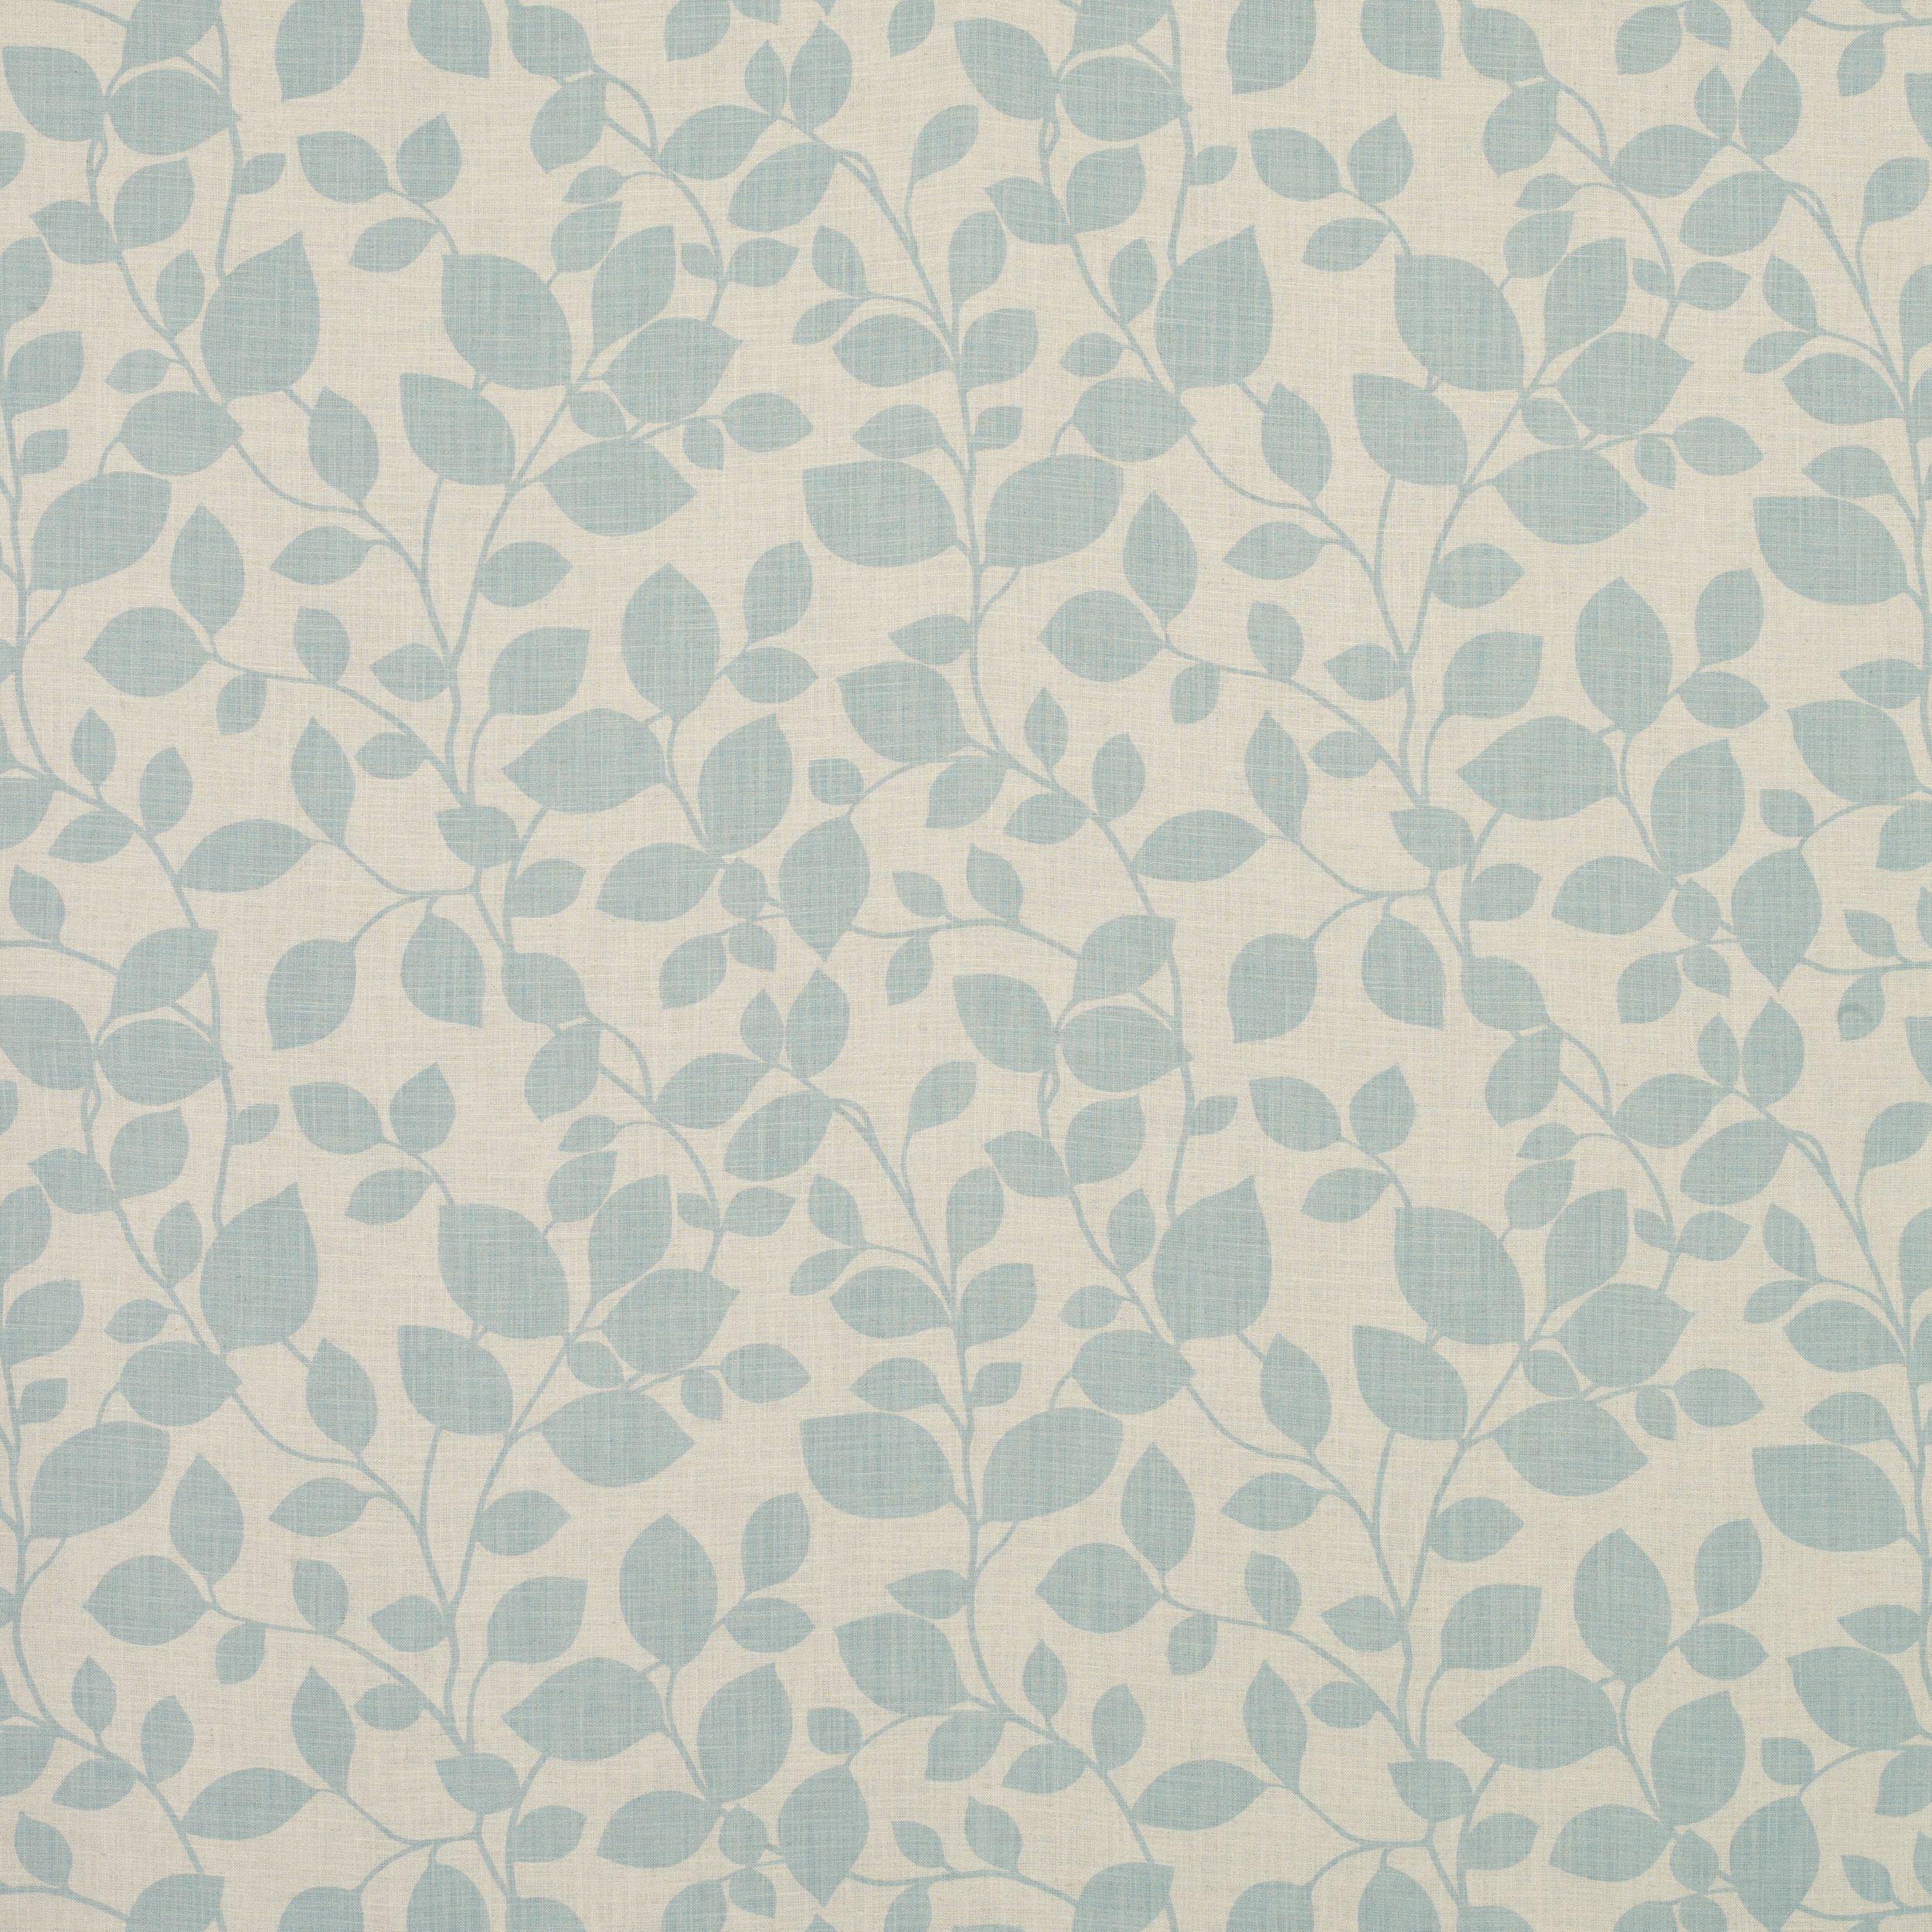 Laura Ashley Chesil Duck Egg Curtain Fabric £14 40 per Metre